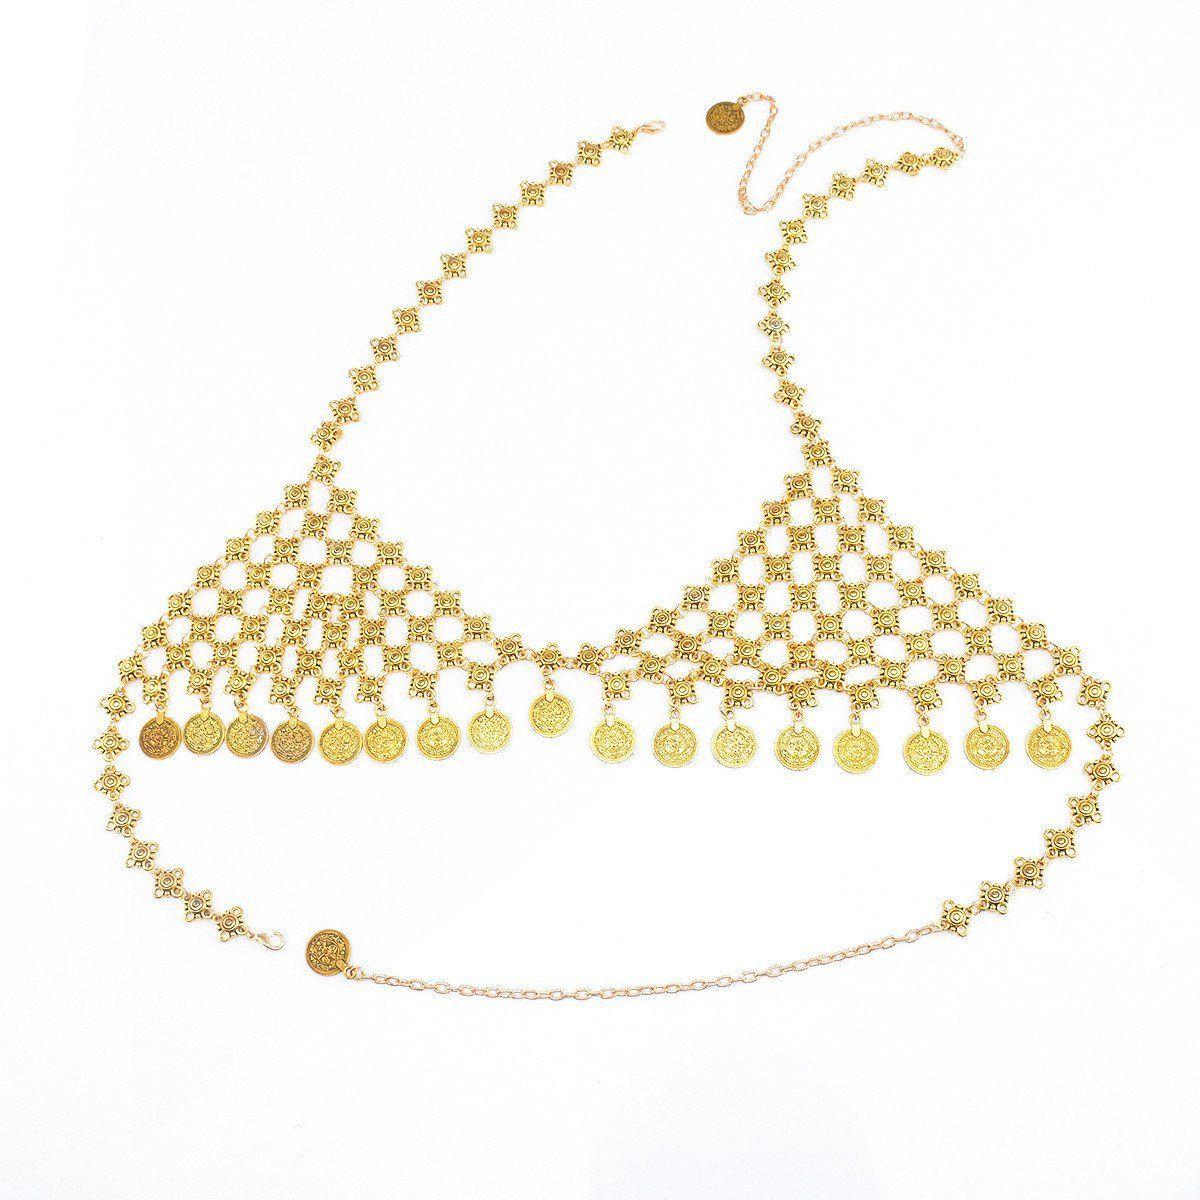 Bridal & Wedding Party Jewelry Diplomatic Traditional Ethnic Cz Stone Goldtone Dangle Earring Women Wedding Jewellery